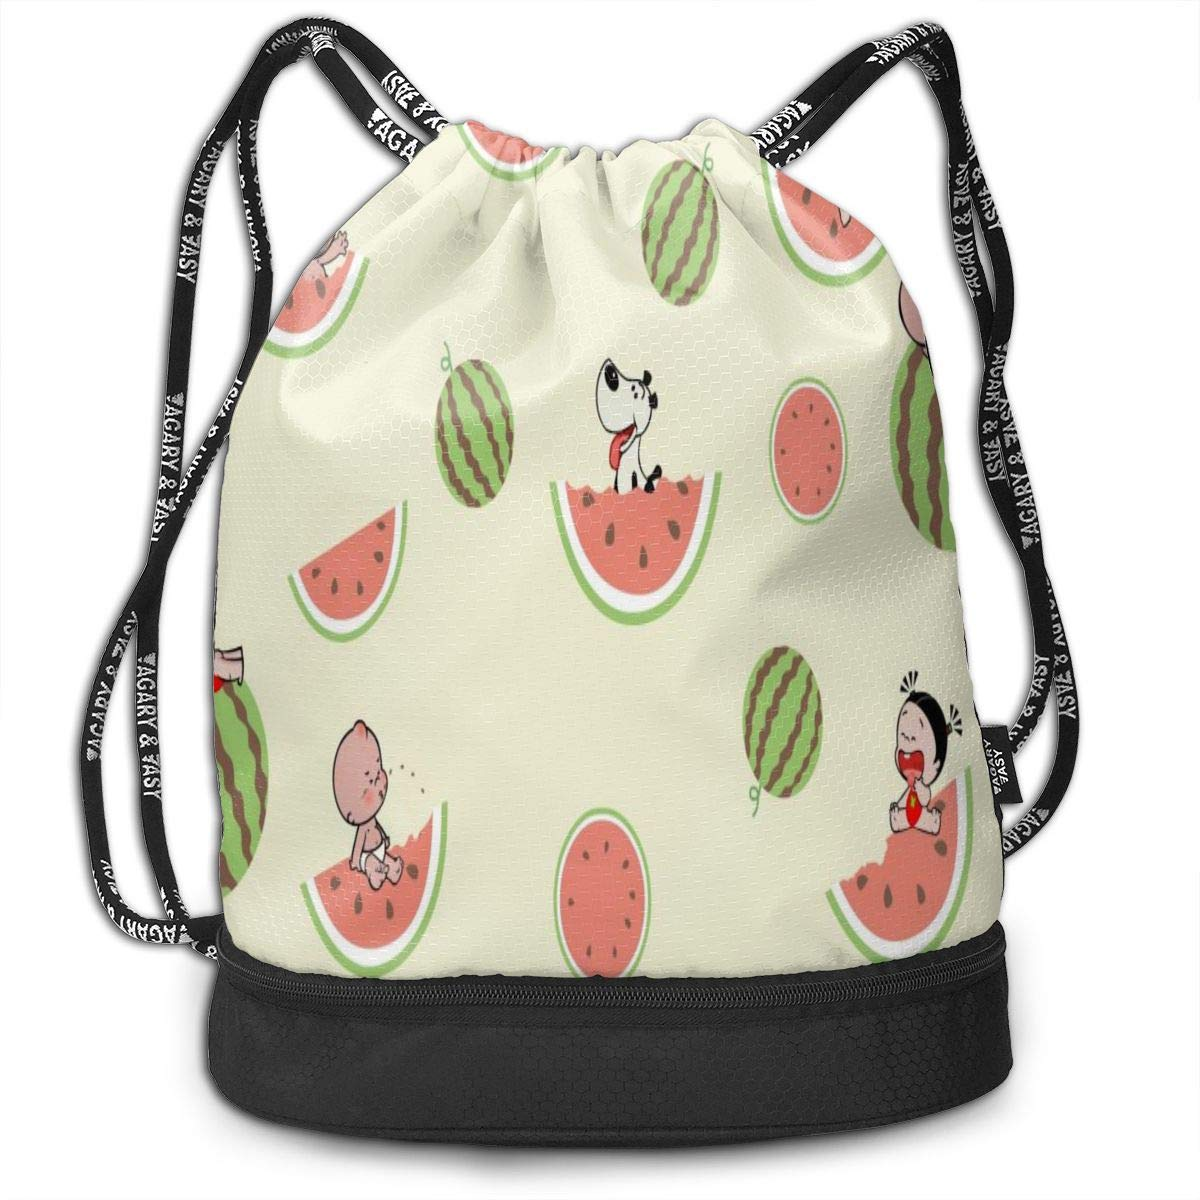 Watermelon Beam Mouth Drawstring Backpack Waterproof Shoulder Strap Leisure Backpack Portable Gym Bag